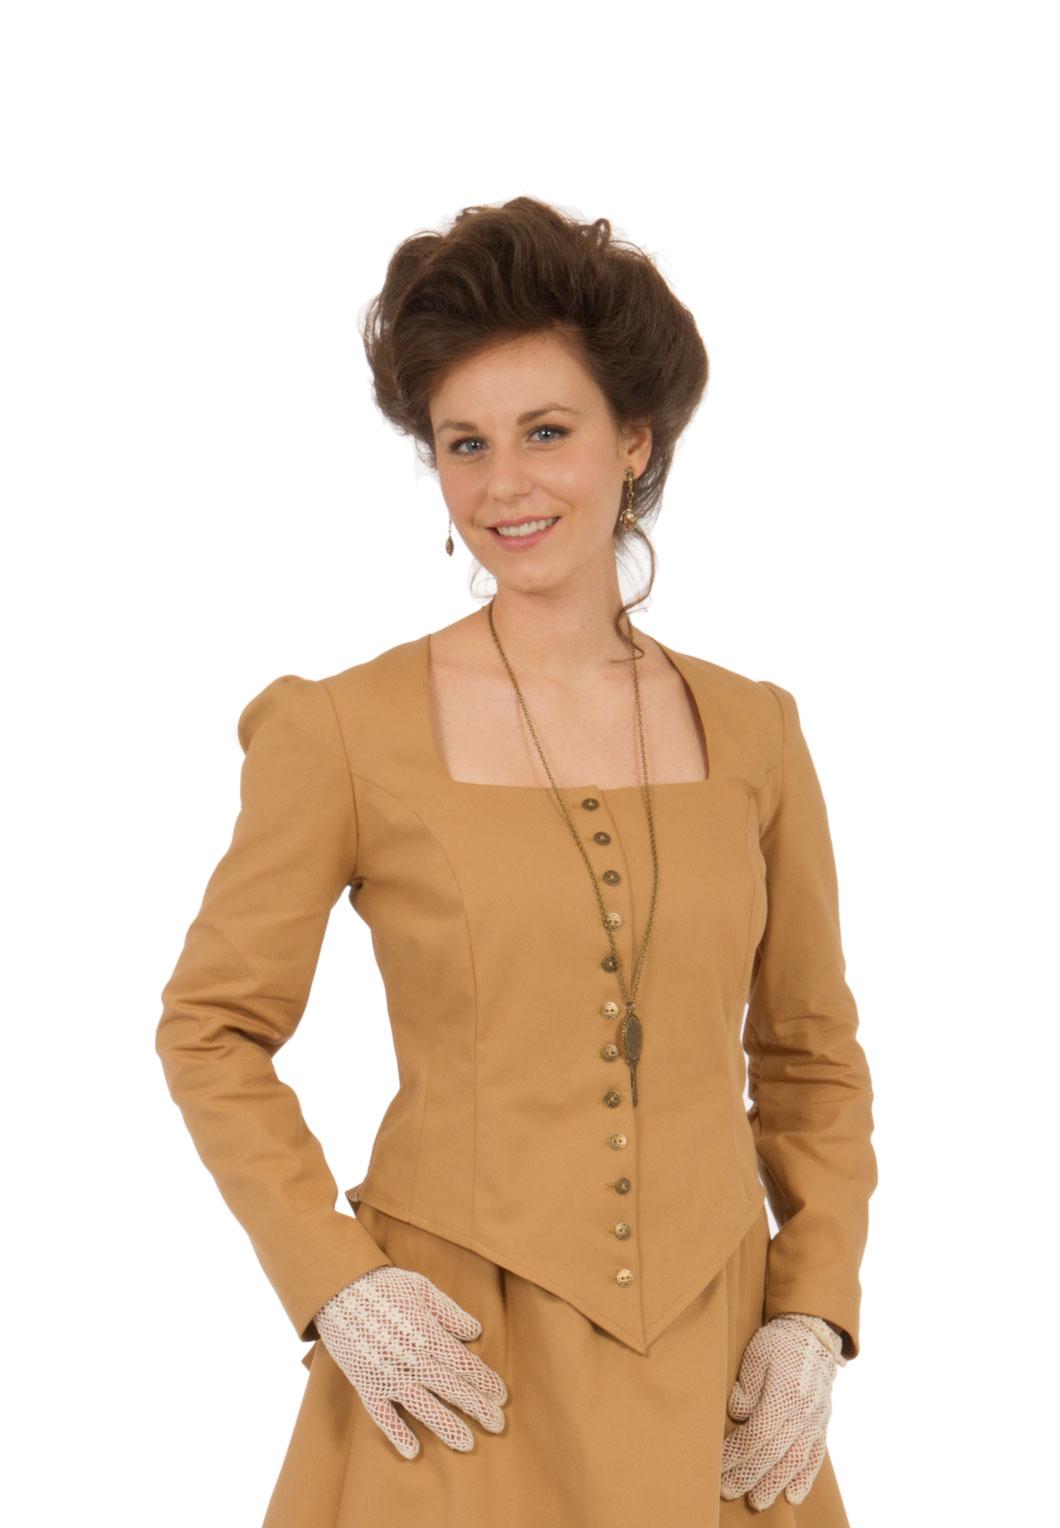 266143c144ca Victorian Old West Twill Jacket. $119.95. Twill Victorian Style Jacket